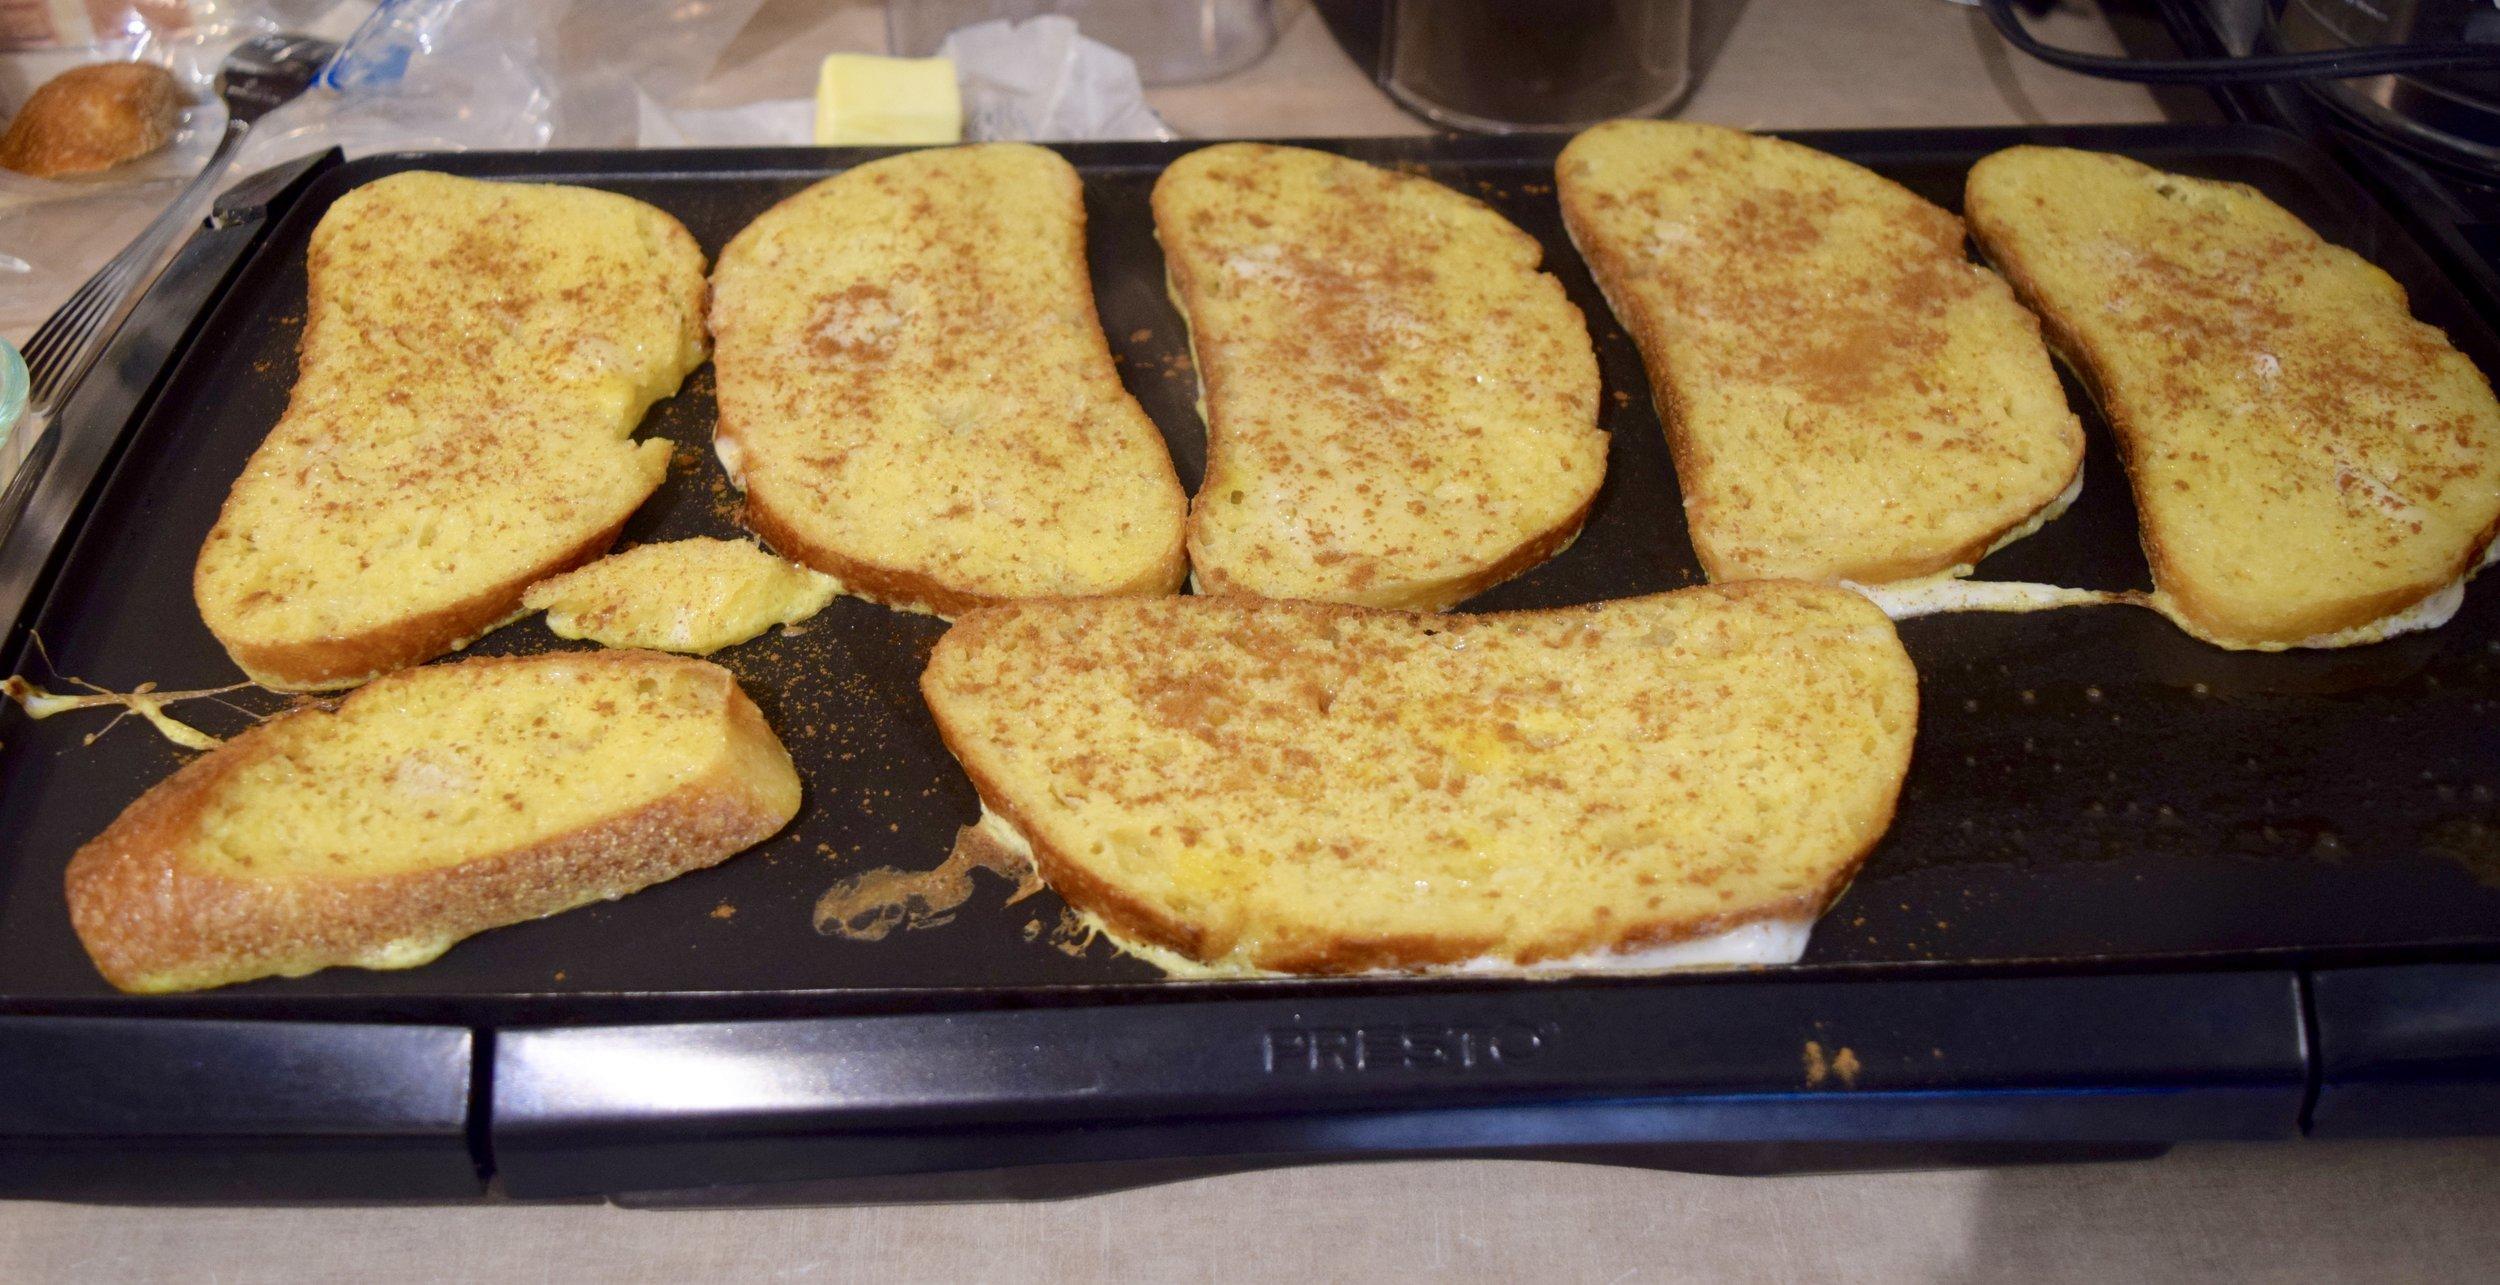 french_toast_presto_griddle.jpg